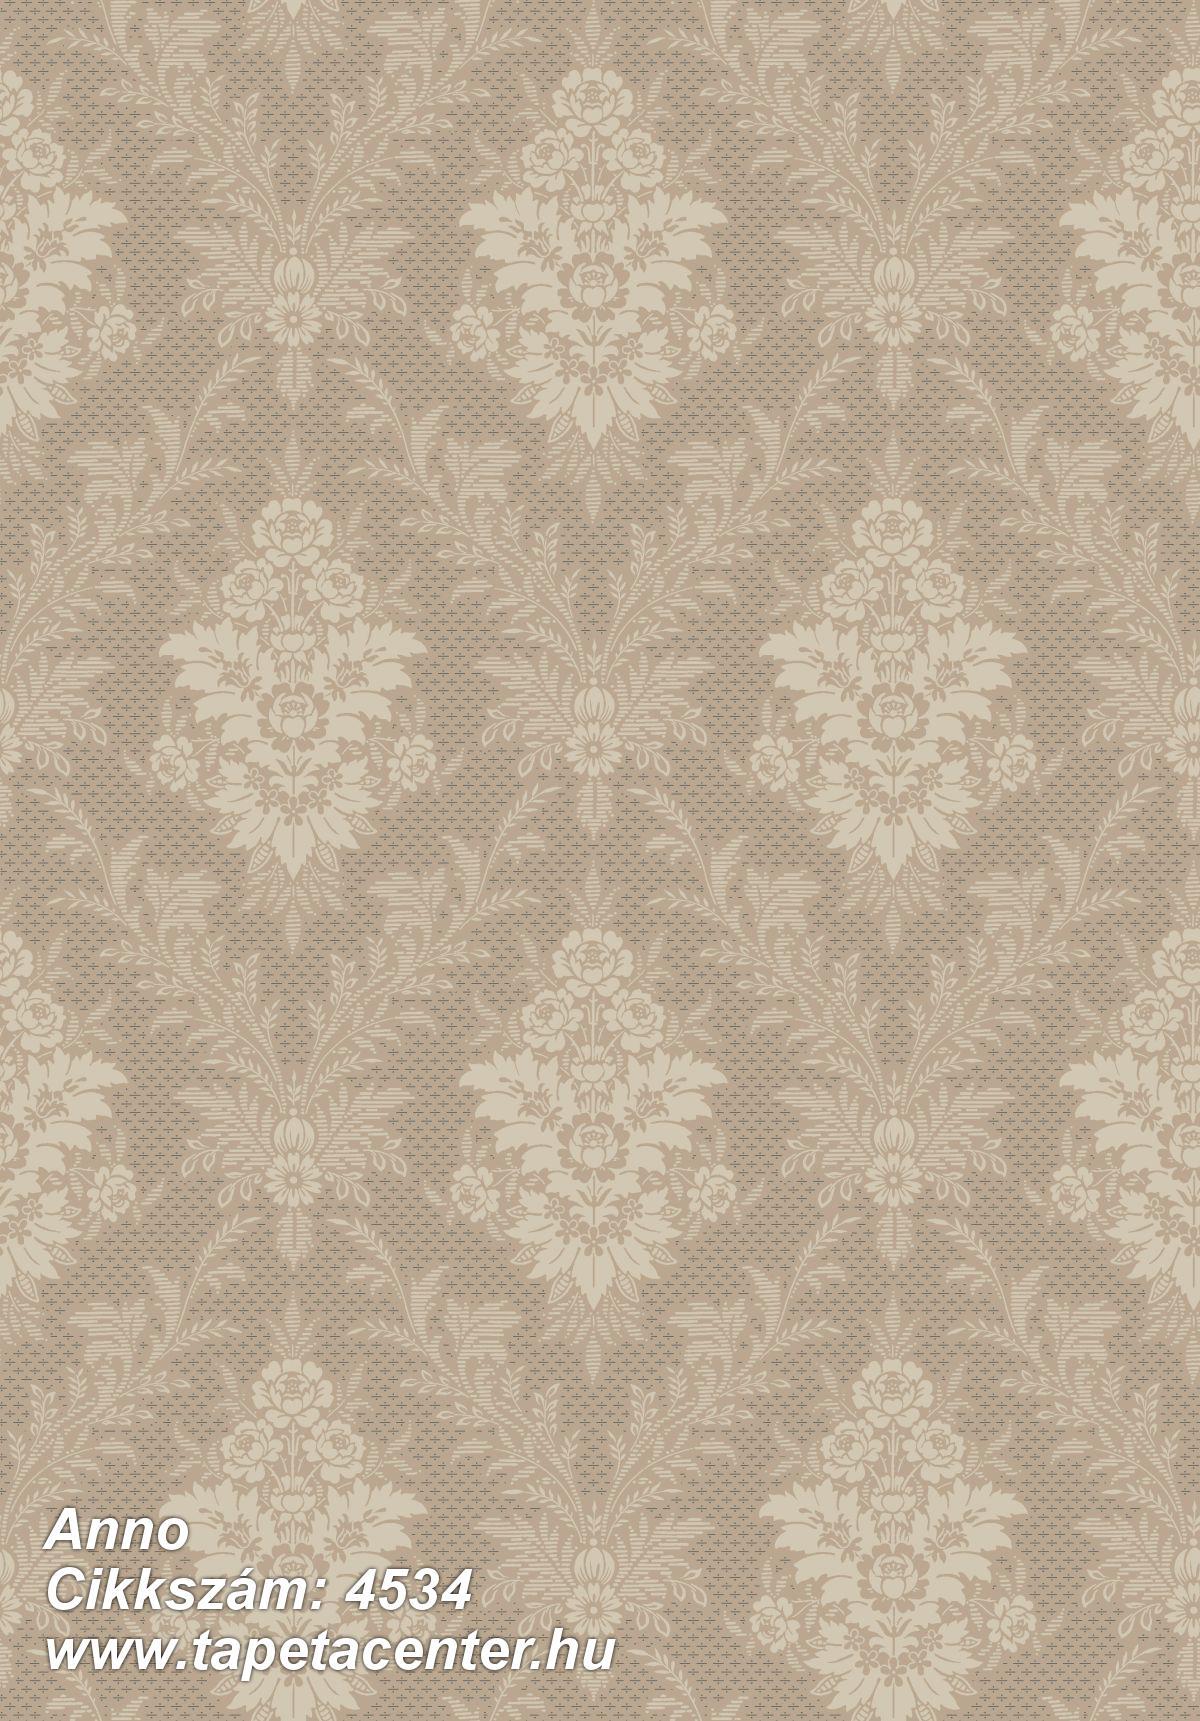 Barokk-klasszikus,bézs-drapp,bronz,vajszín,lemosható,vlies tapéta